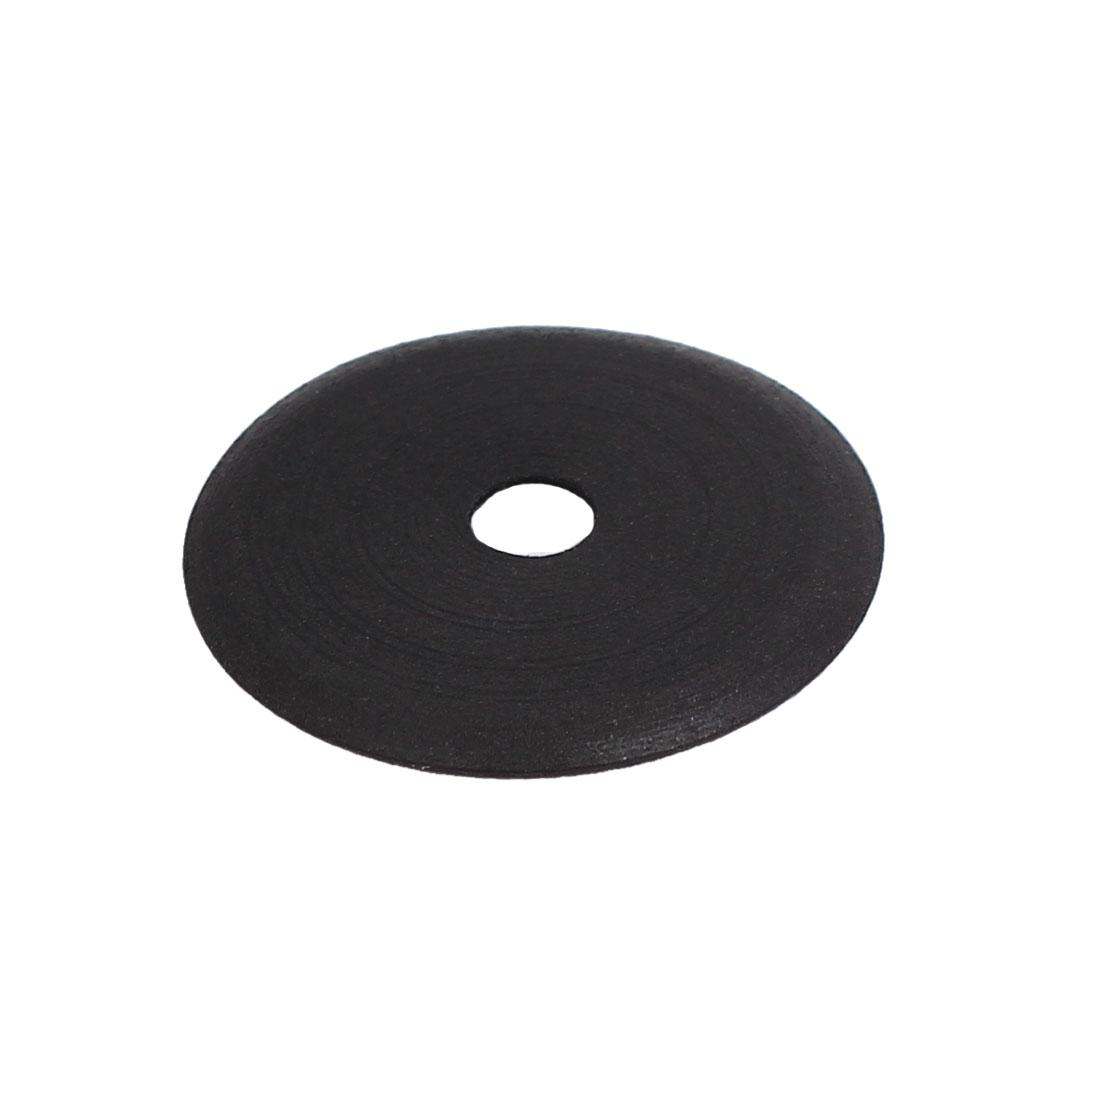 27.2mmx5mmx0.5mm Air Compressor Compression Piston Ring Black